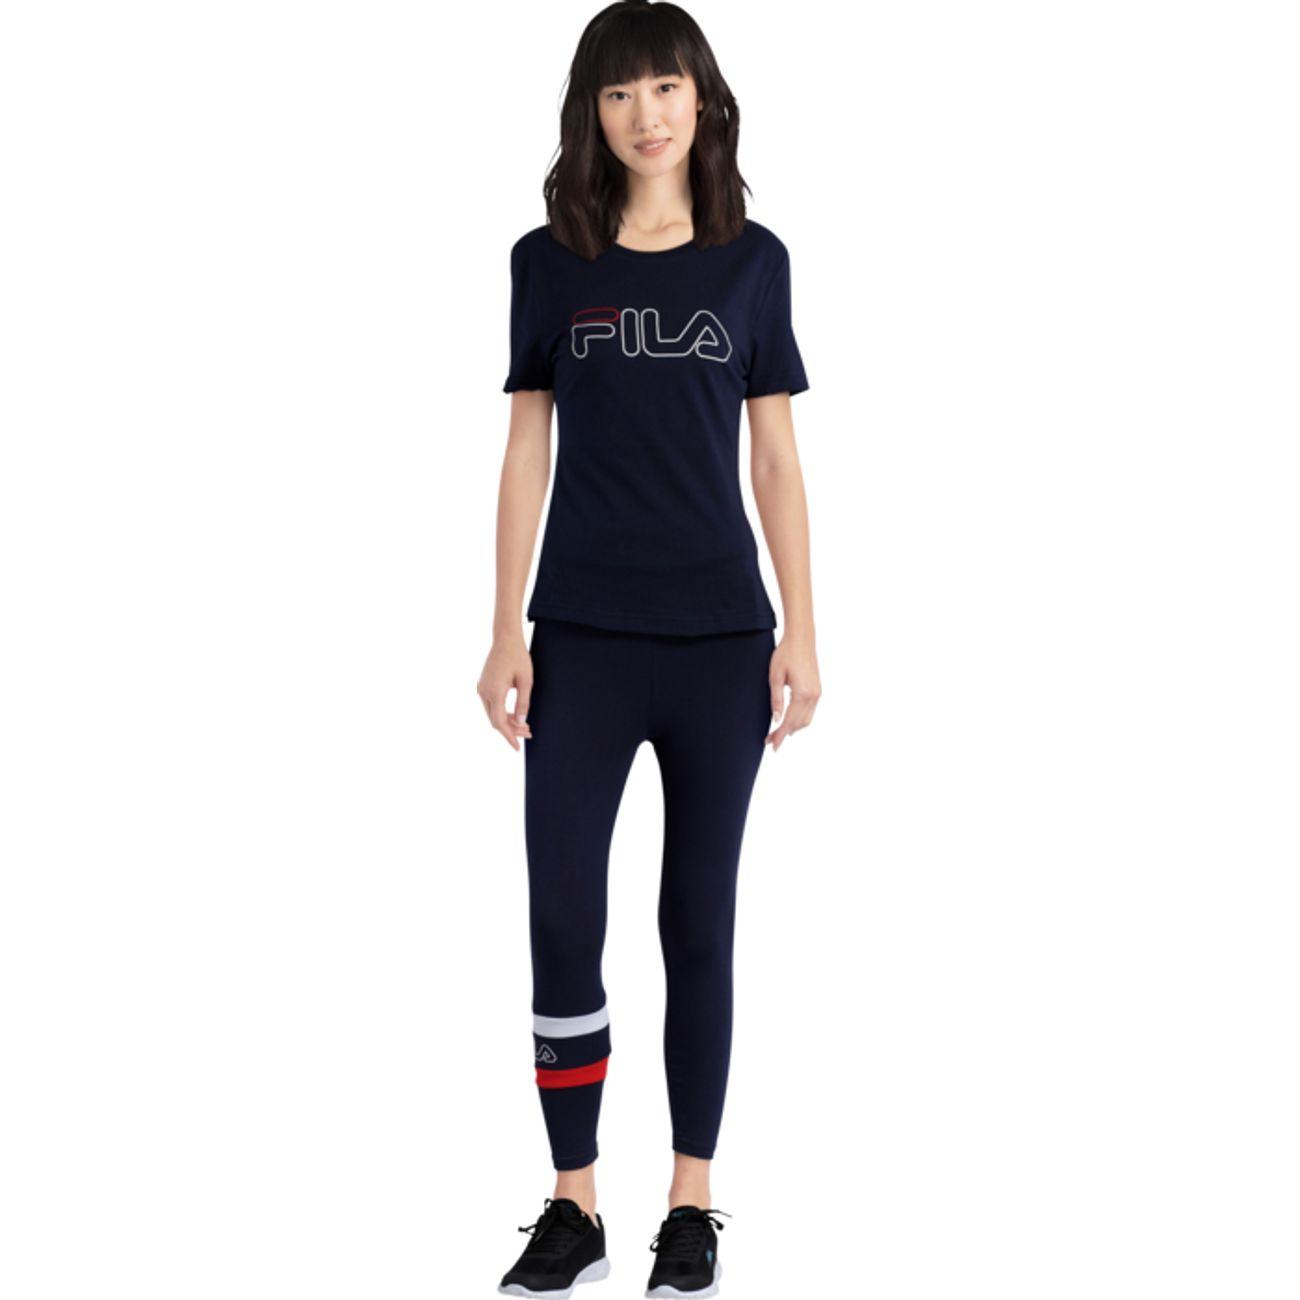 Tee Shirt MC Multisport femme FILA LADAN